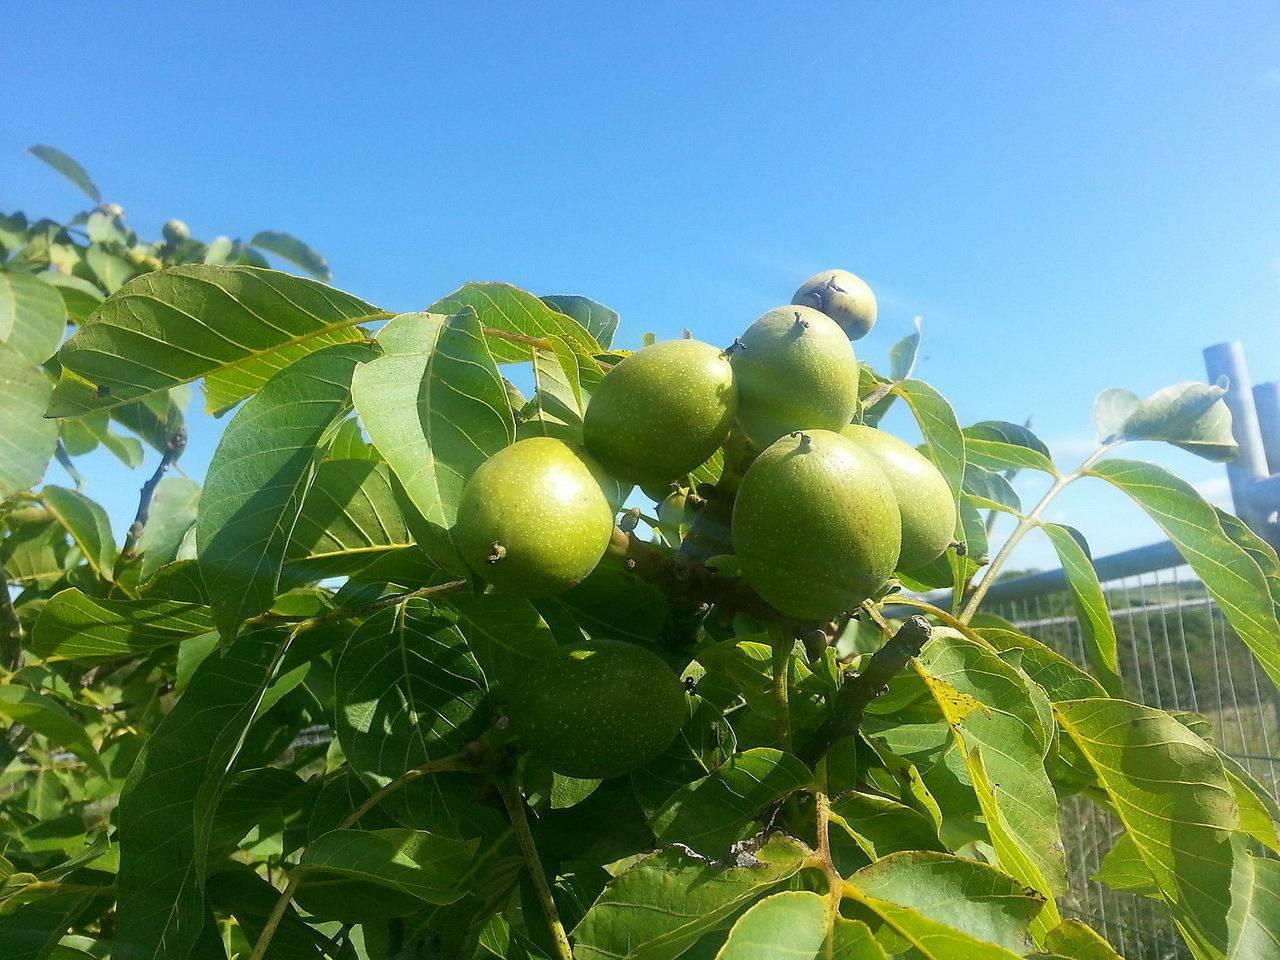 Закладка грецкого ореха и уход за ними — портал ореховод